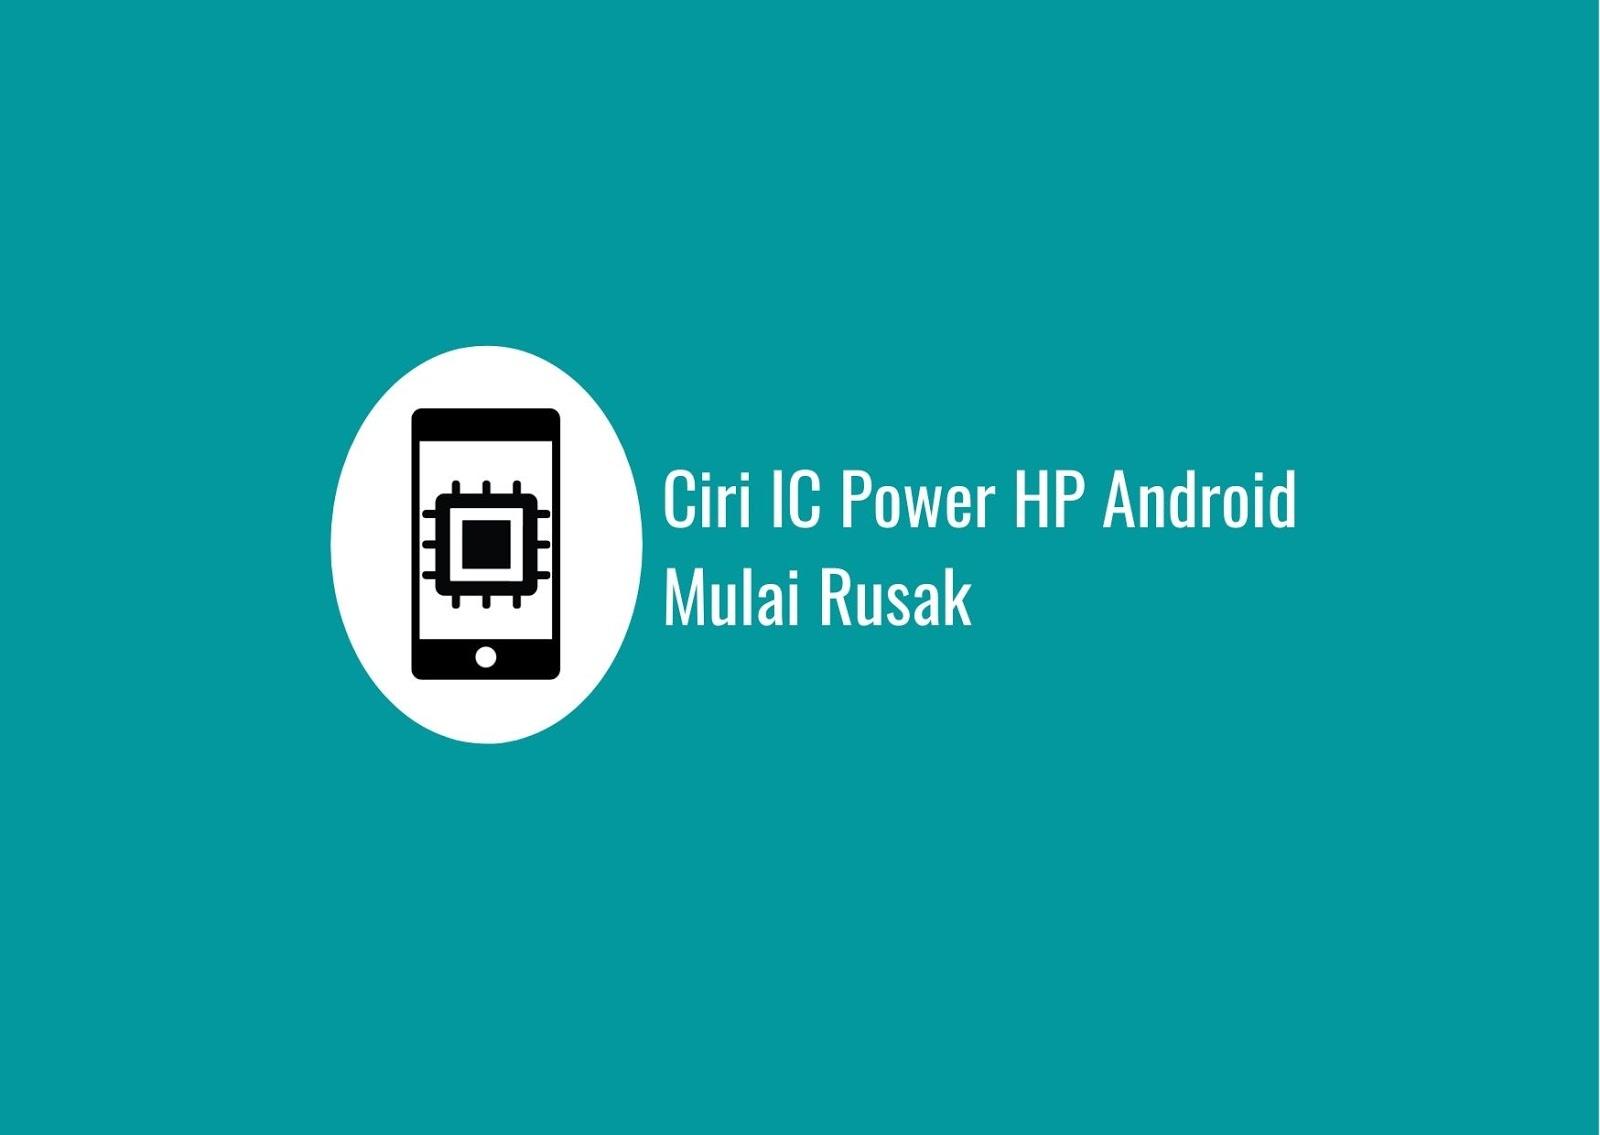 Ciri IC Power HP Android Mulai Rusak